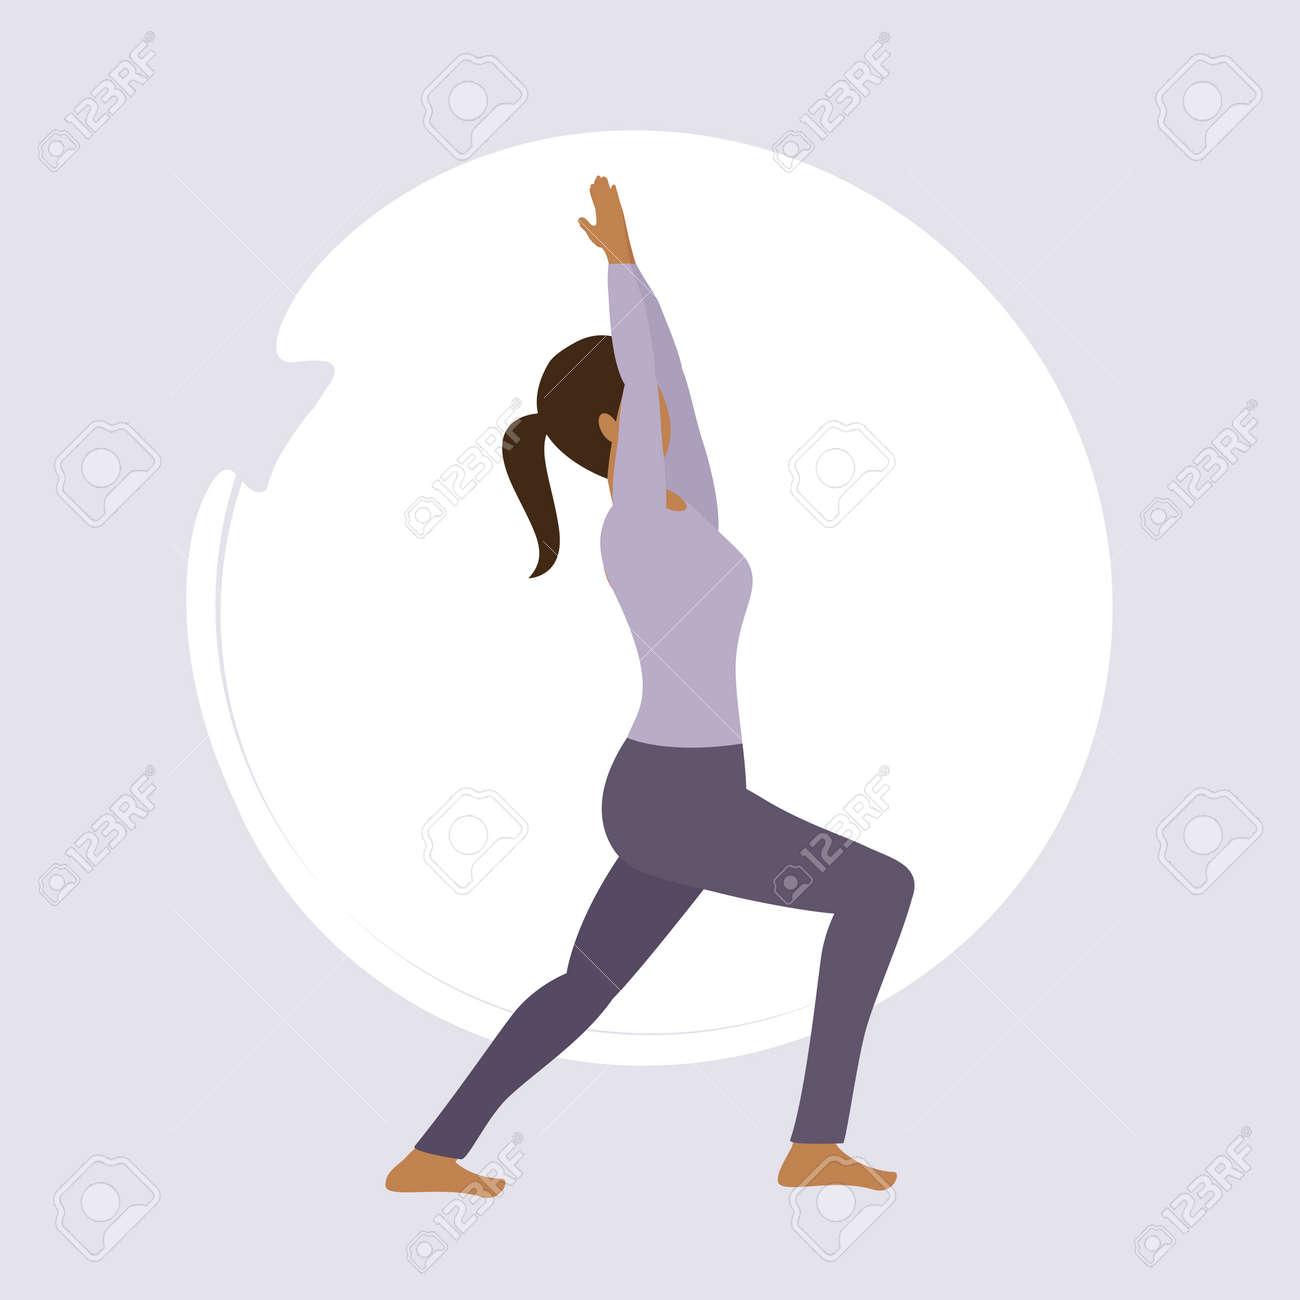 girl doing yoga exercise healthy lifestyle fitness design vector illustration - 168077364